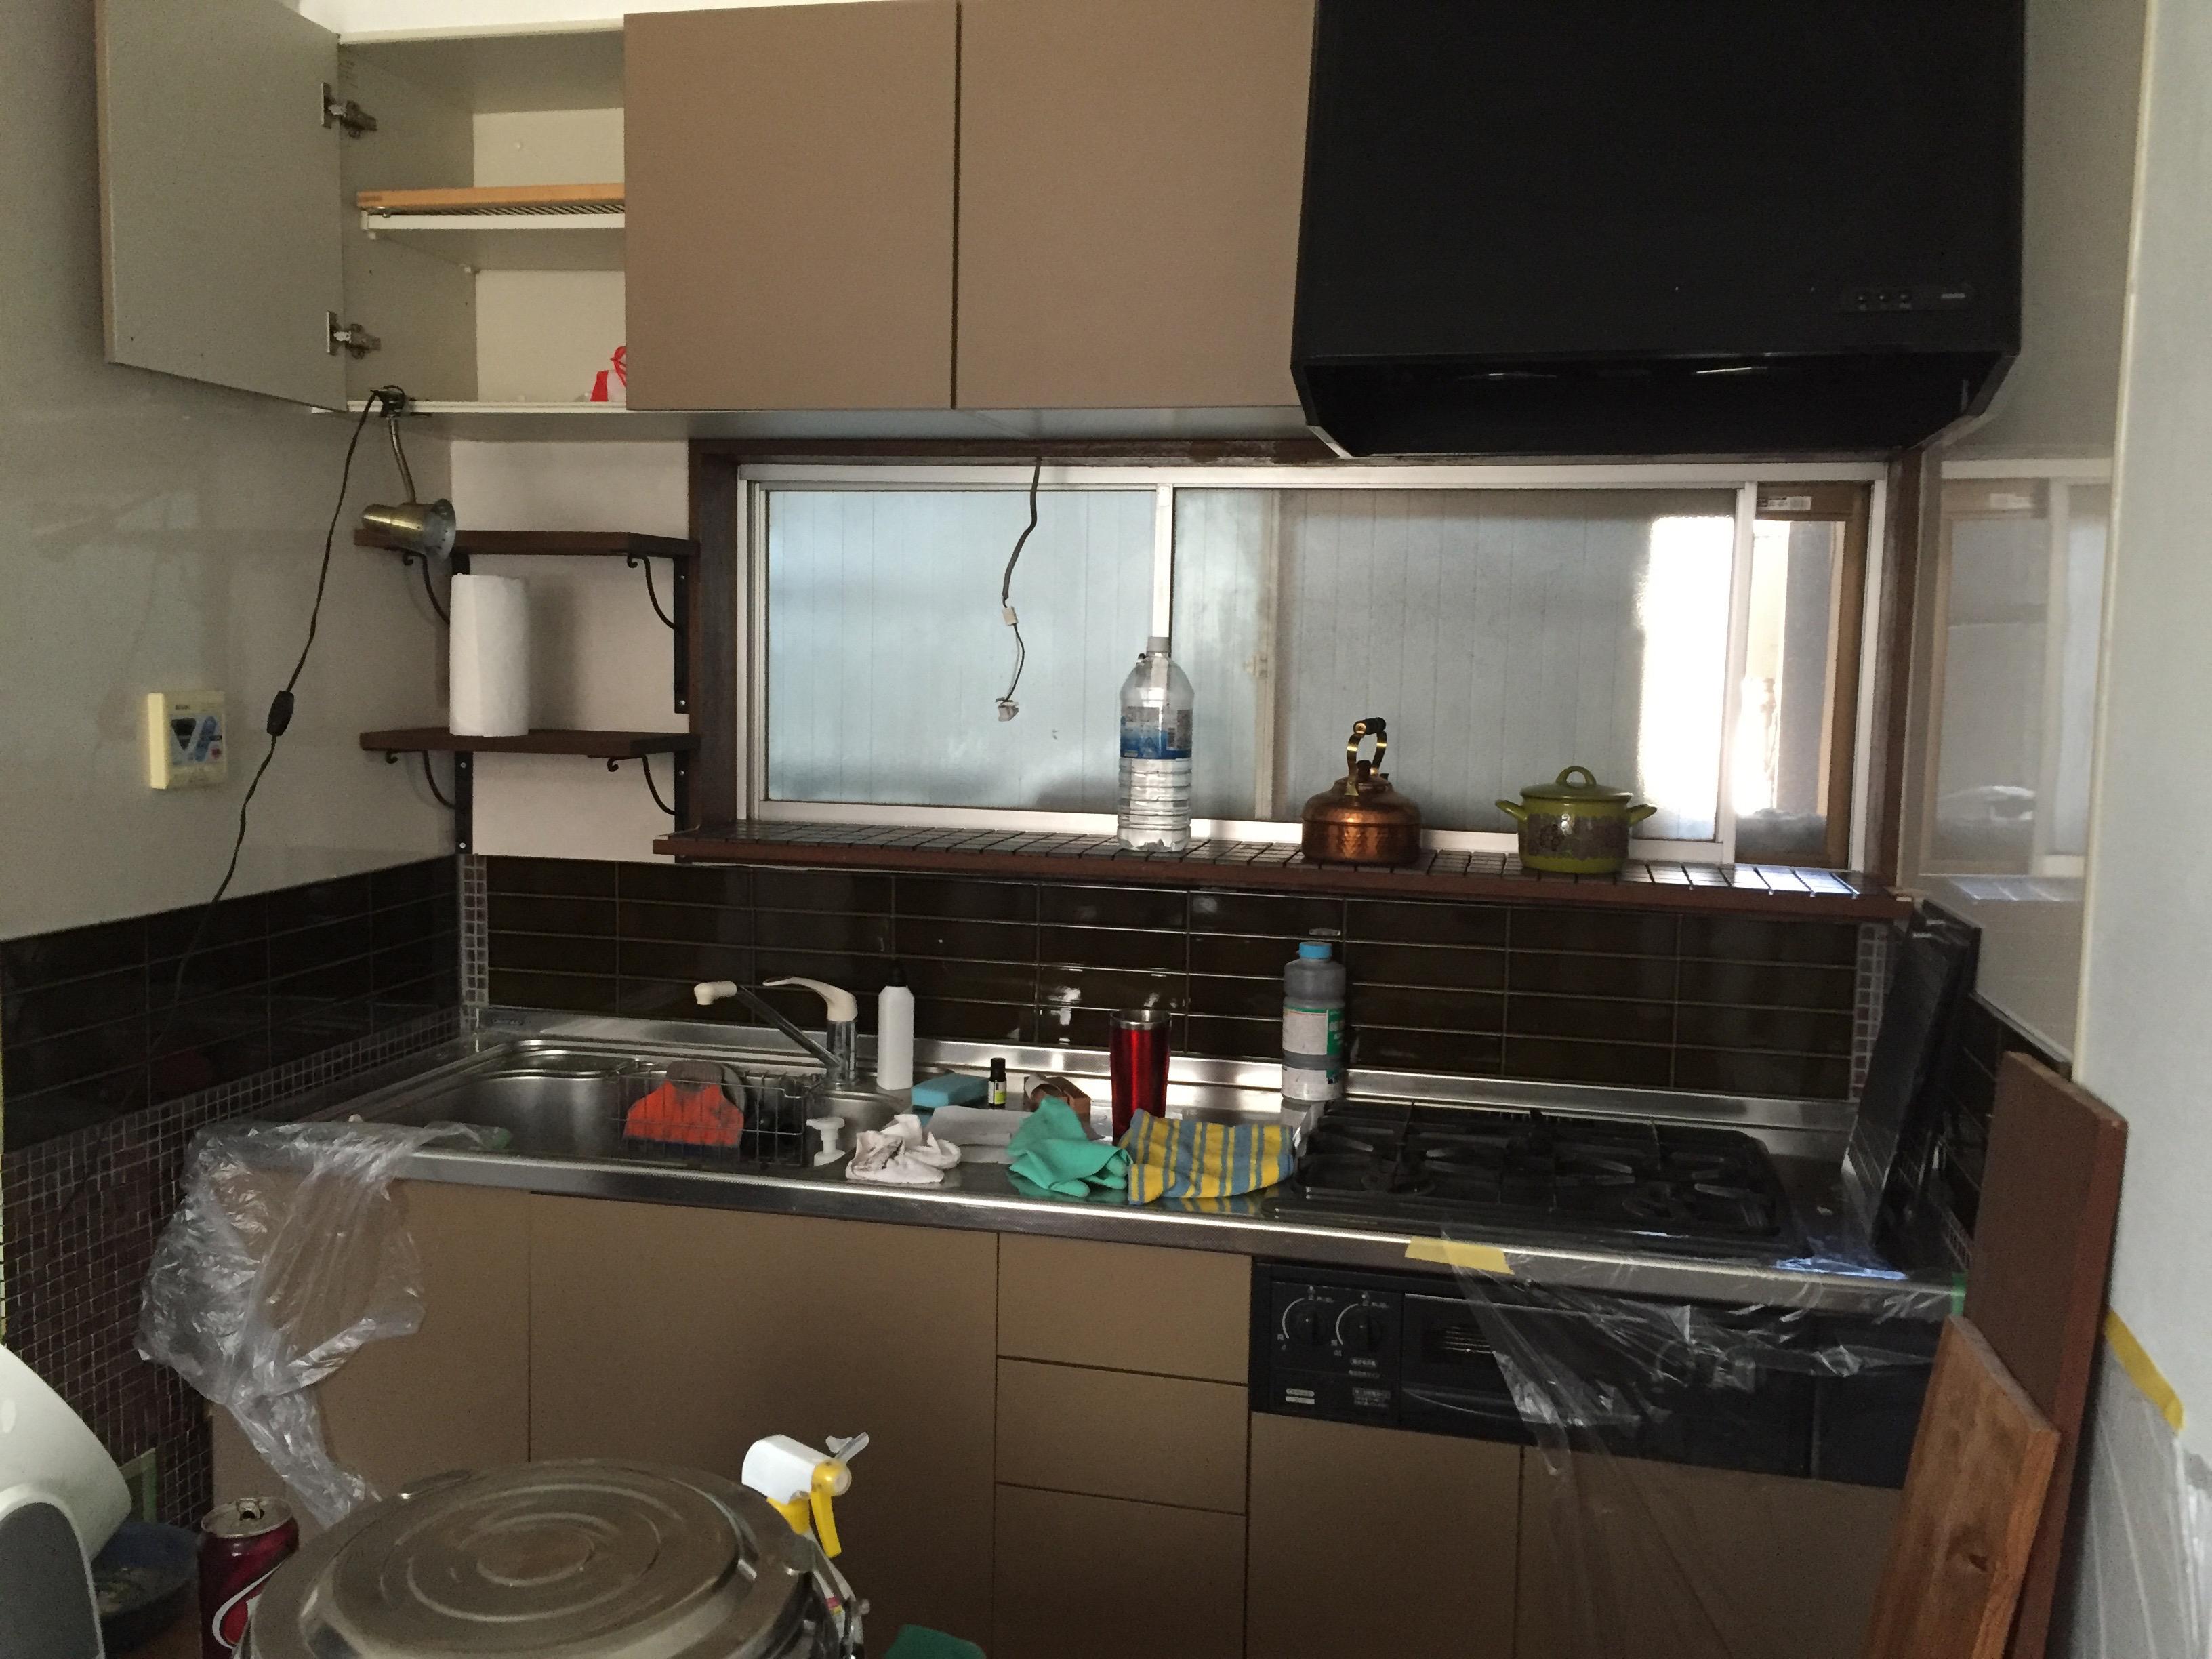 t house キッチン棚つけ